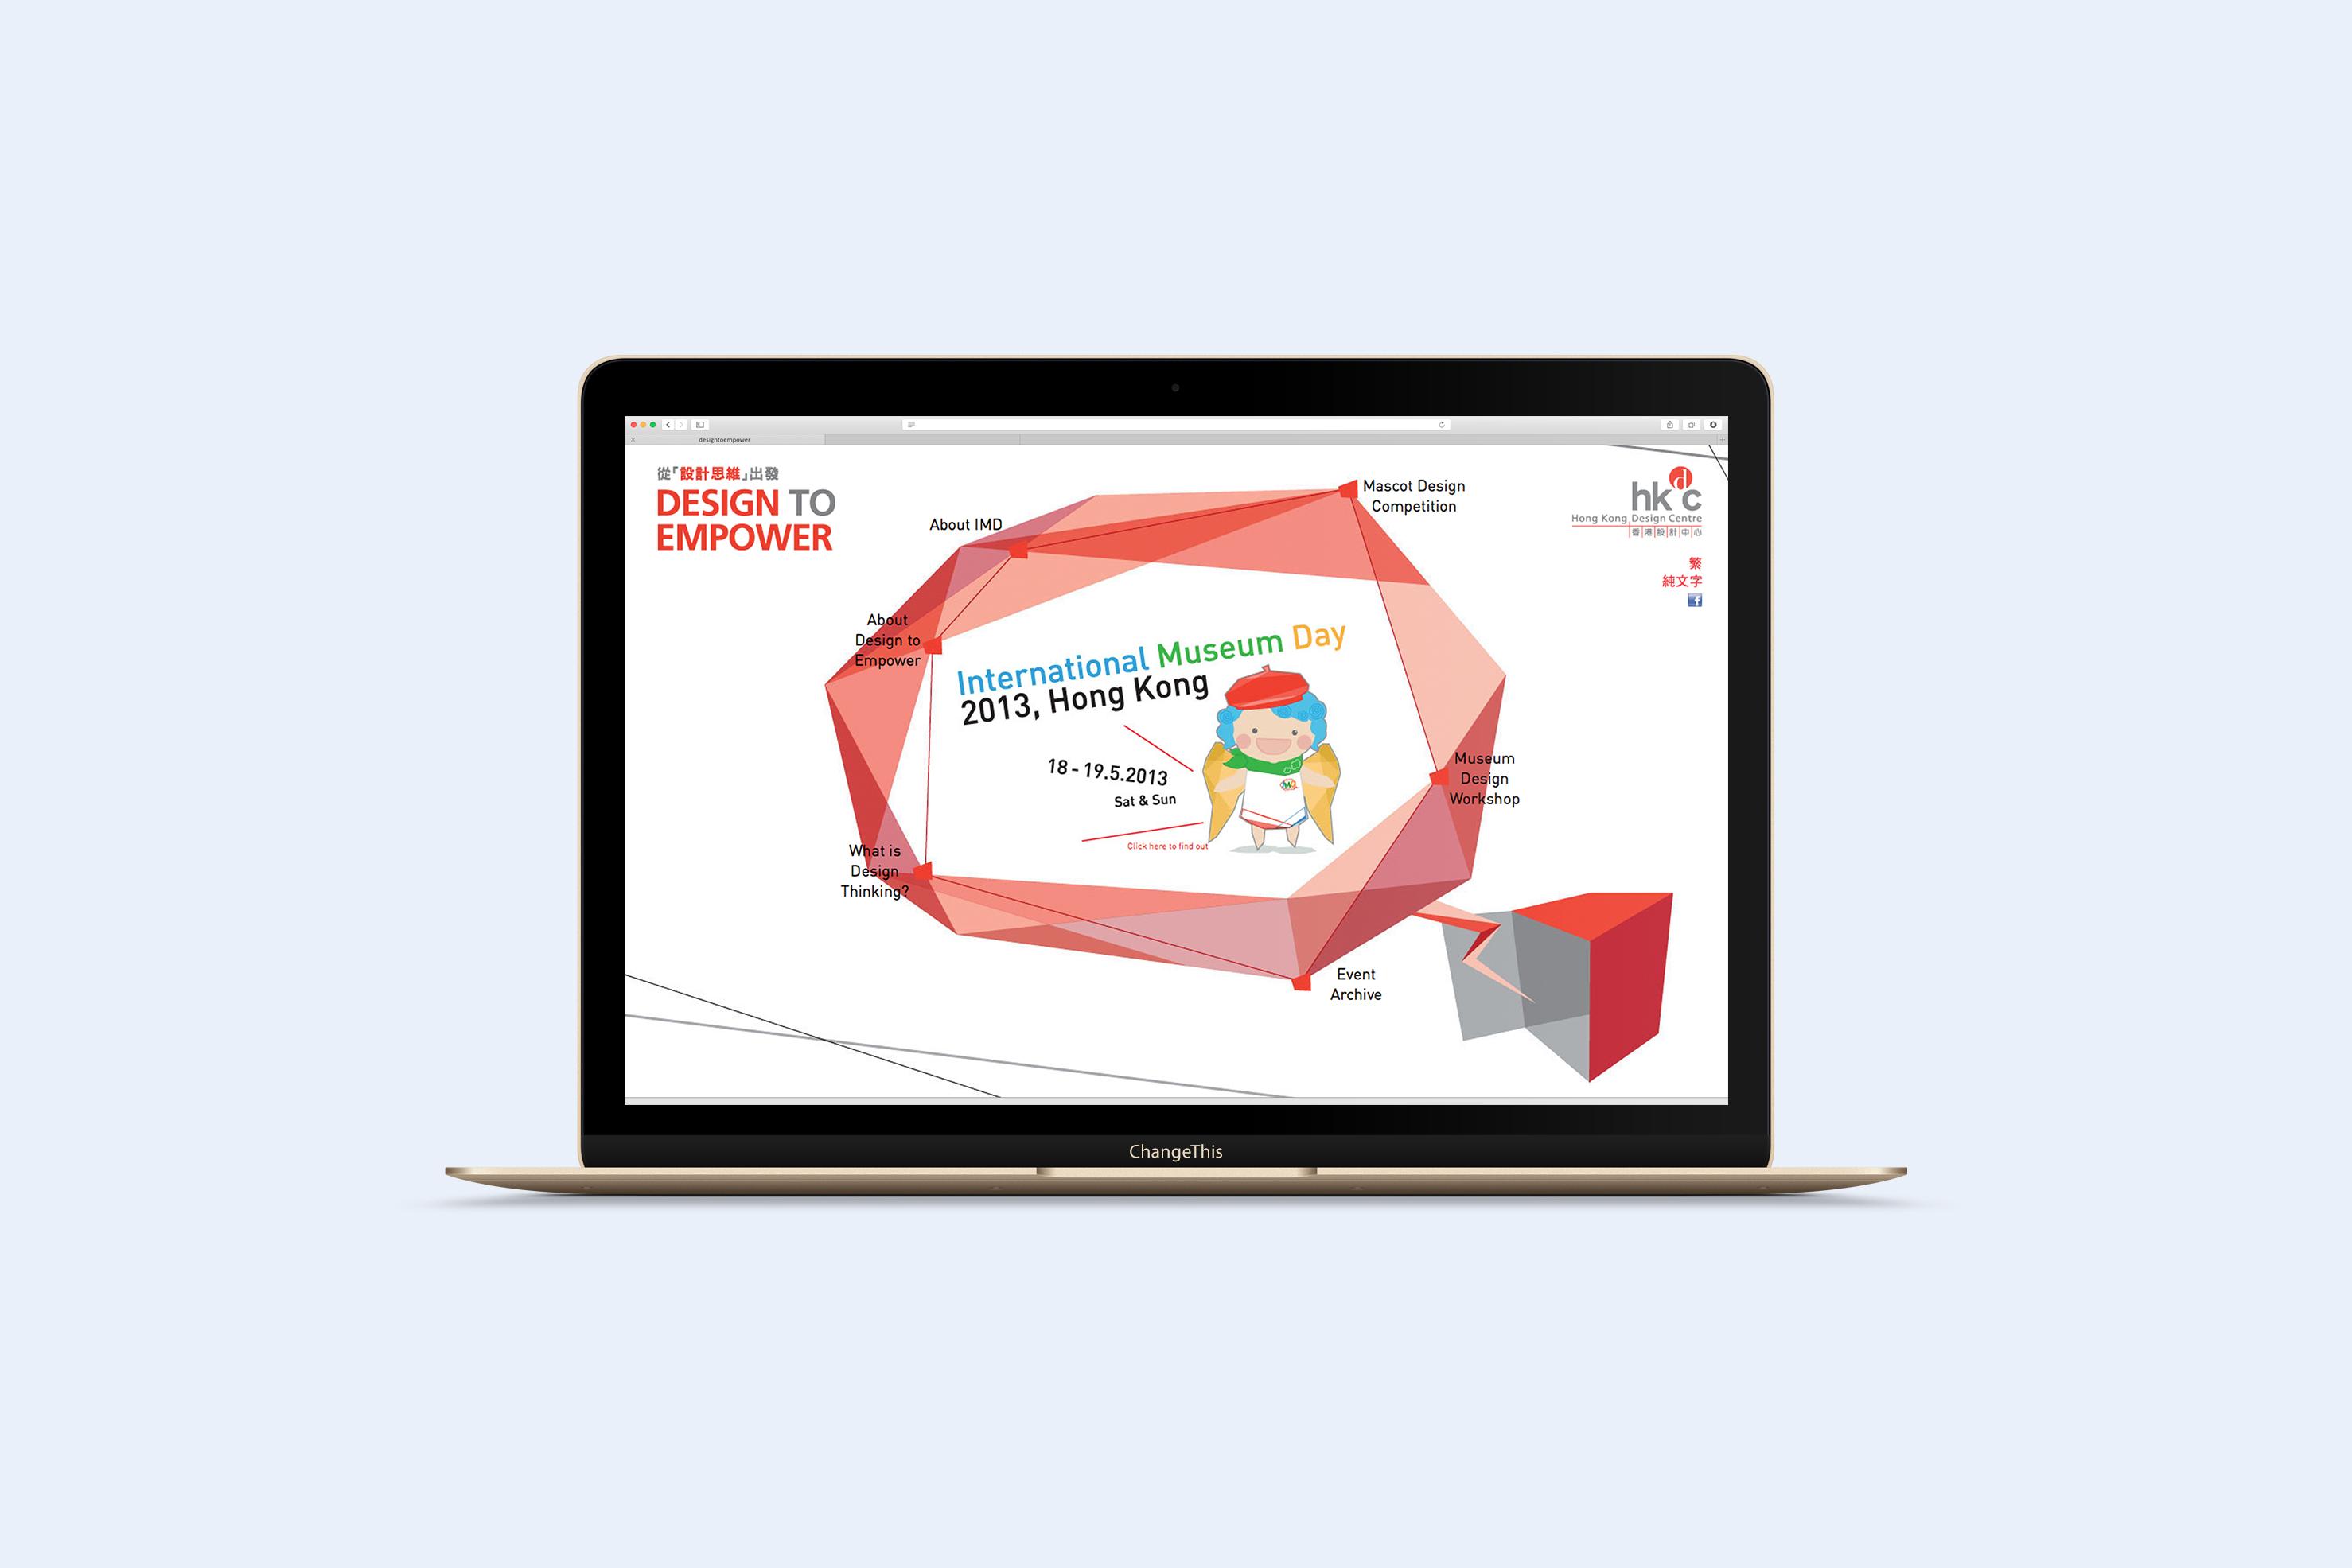 Design to Empower (event website)